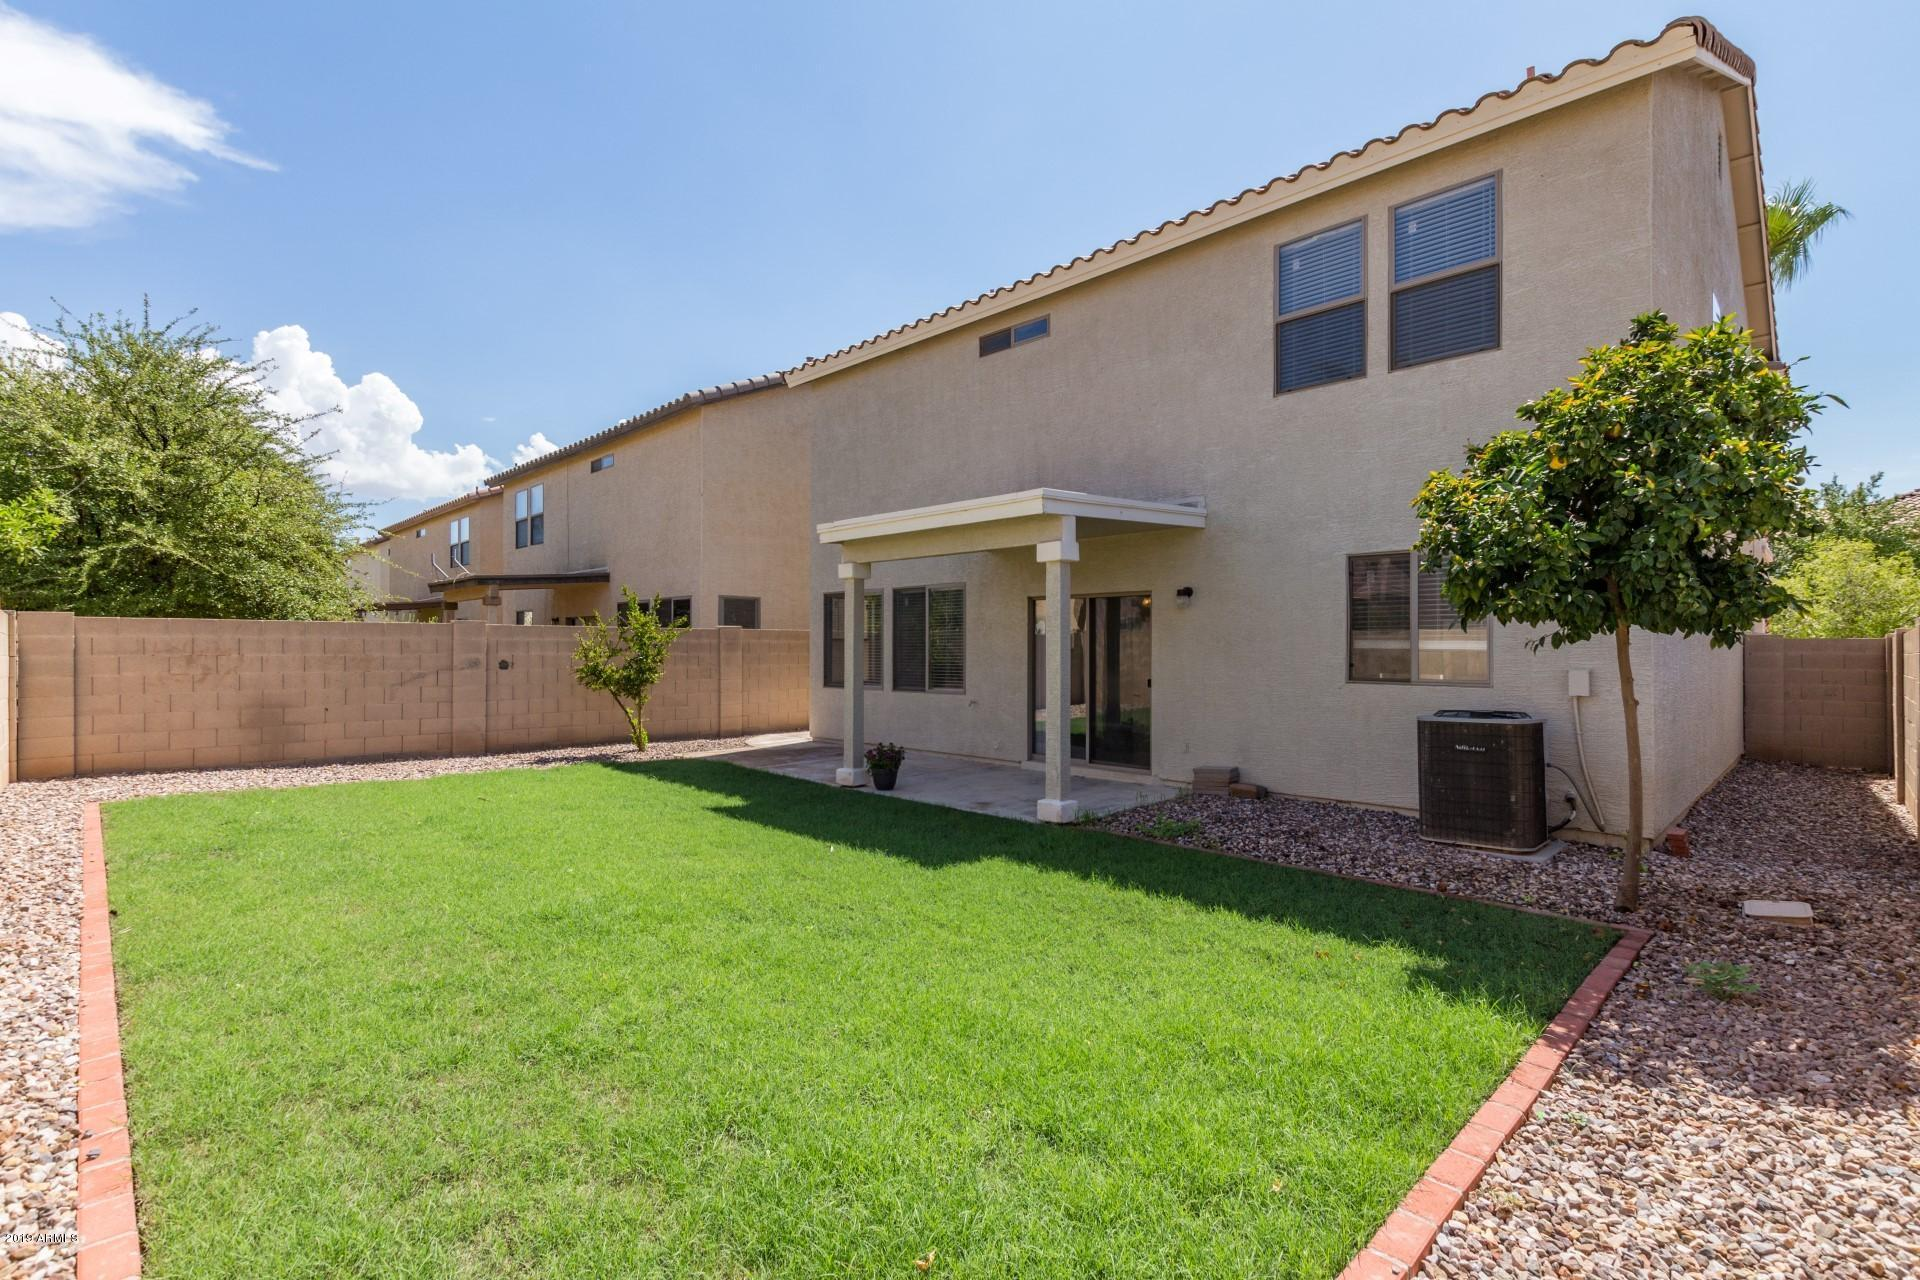 MLS 5971112 4516 E LOS ALAMOS Street, Gilbert, AZ 85295 Gilbert AZ Gateway Village